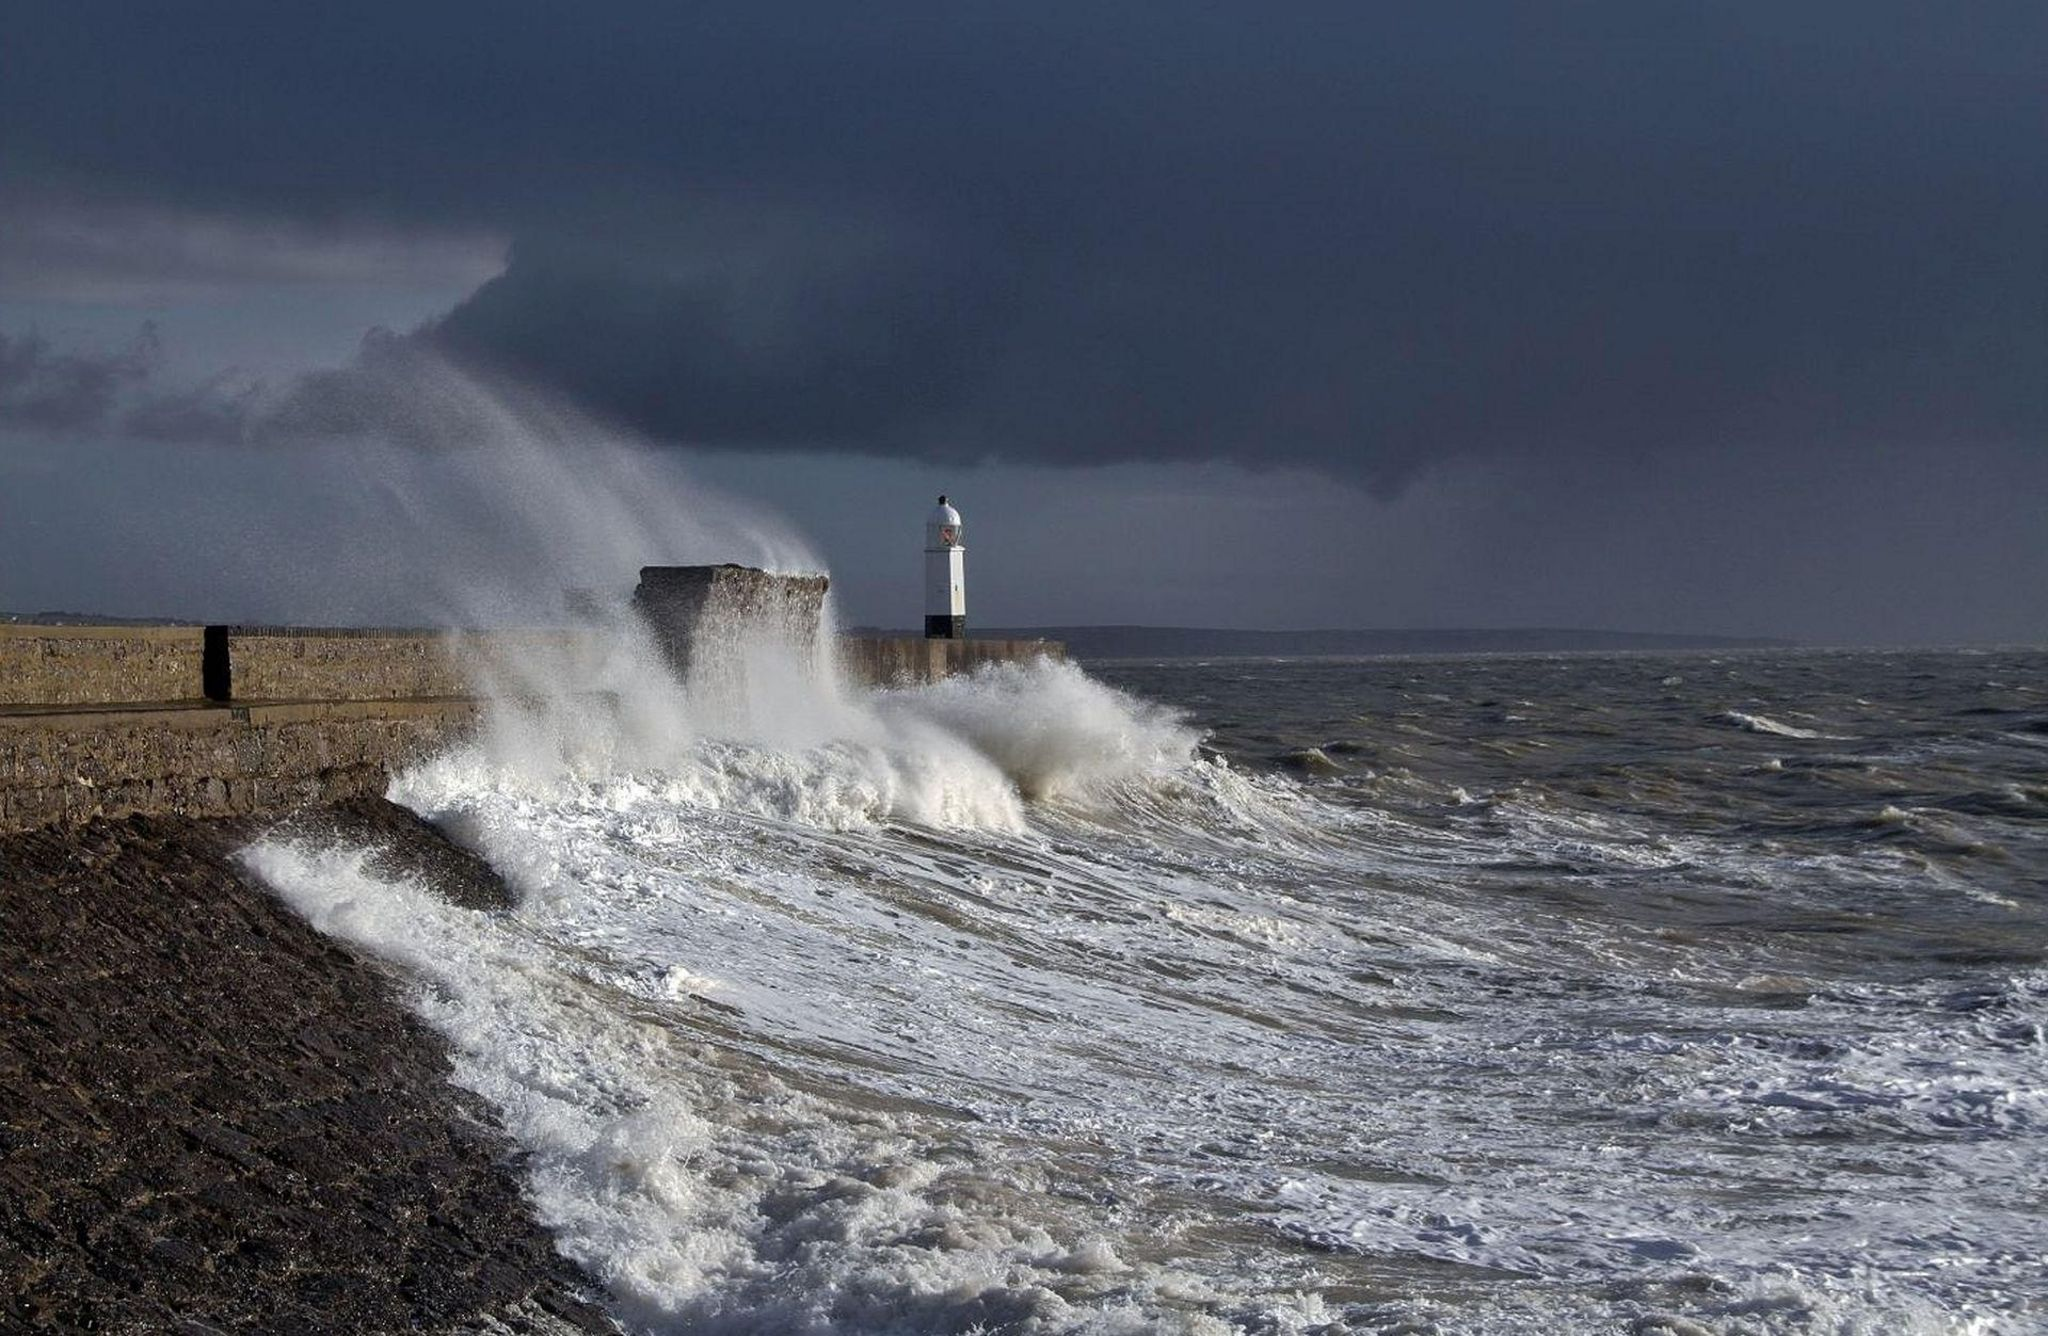 Waves crashing at a beach in Porthcawl Bridgend, south coast of Wales